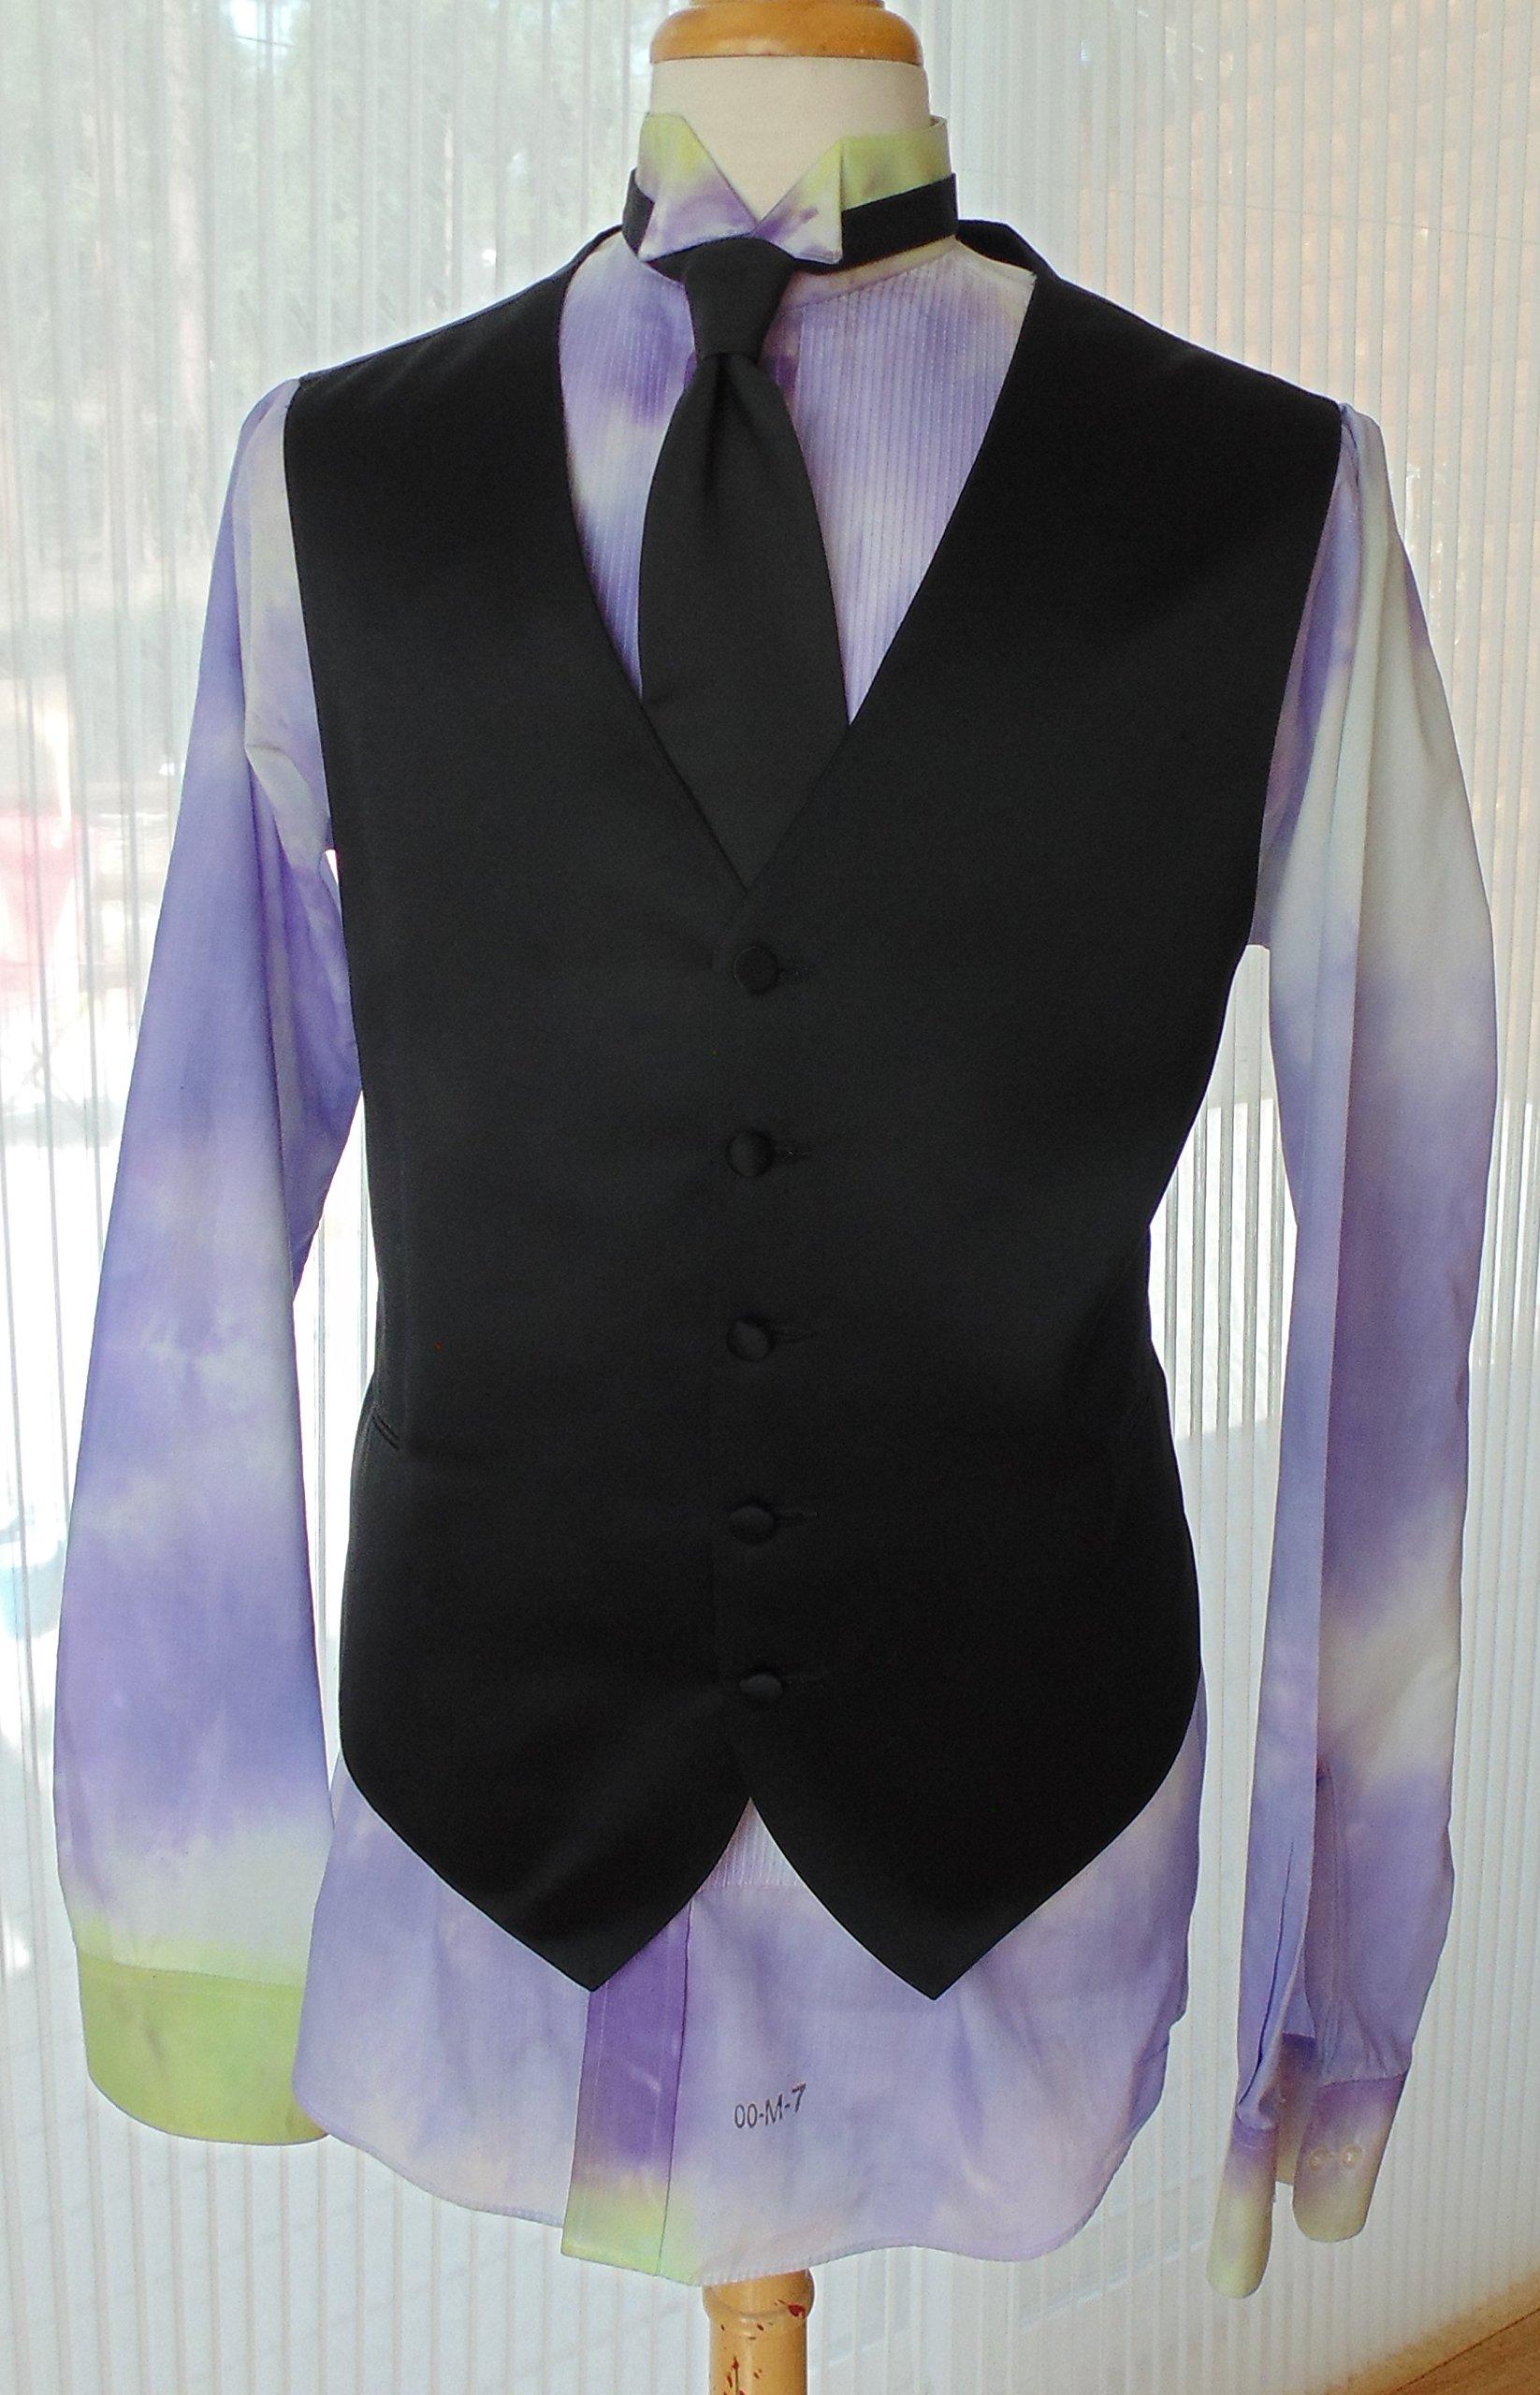 Men's M 36-37 Hand Tie Dye Tuxedo Shirt